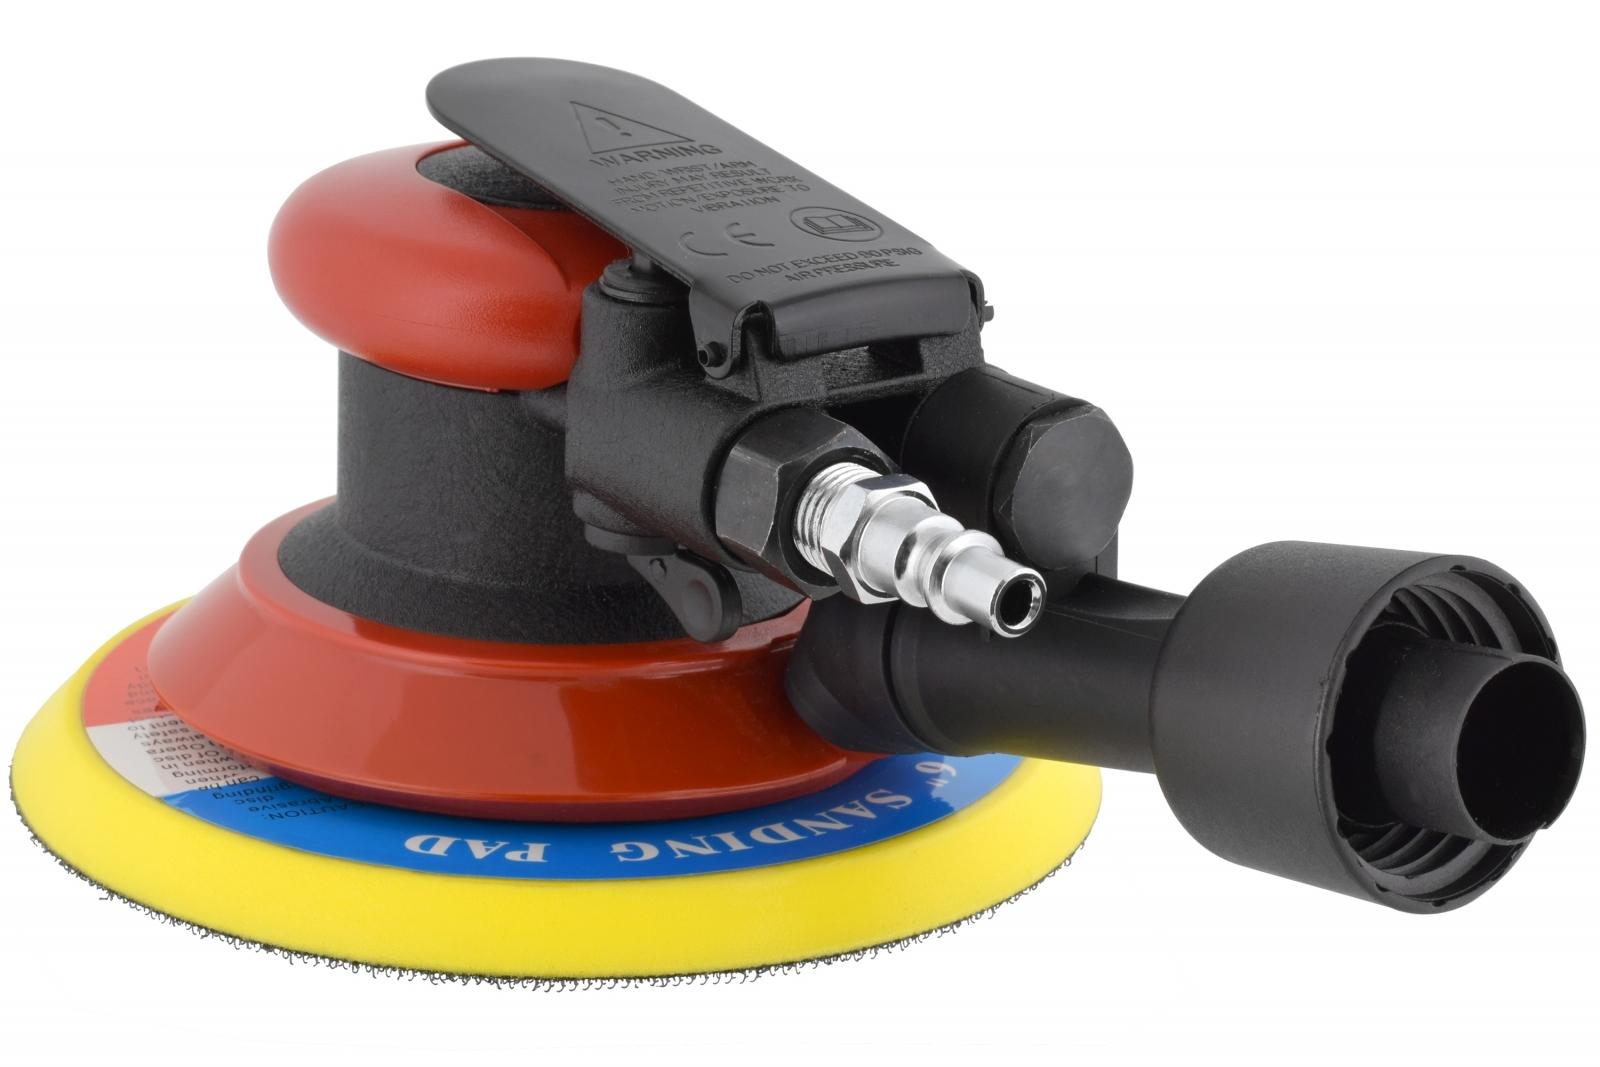 Lixadeira Pneumática Roto Orbital Hookit Zeffix Lx7 Aspirada - Ferramentas MEP